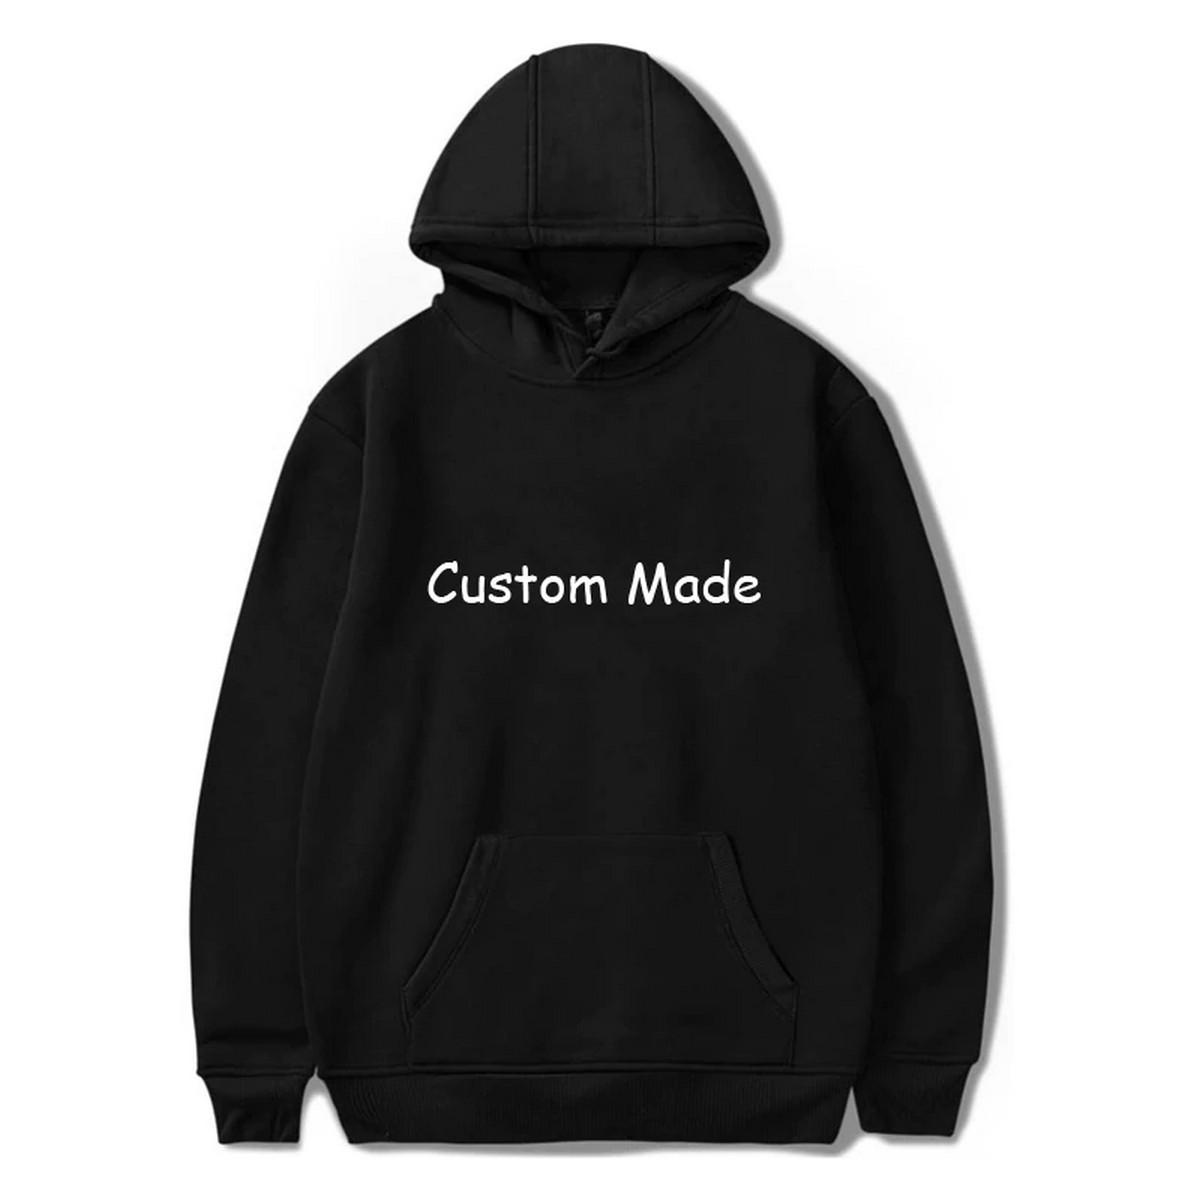 Customised printed hoodie for men and women